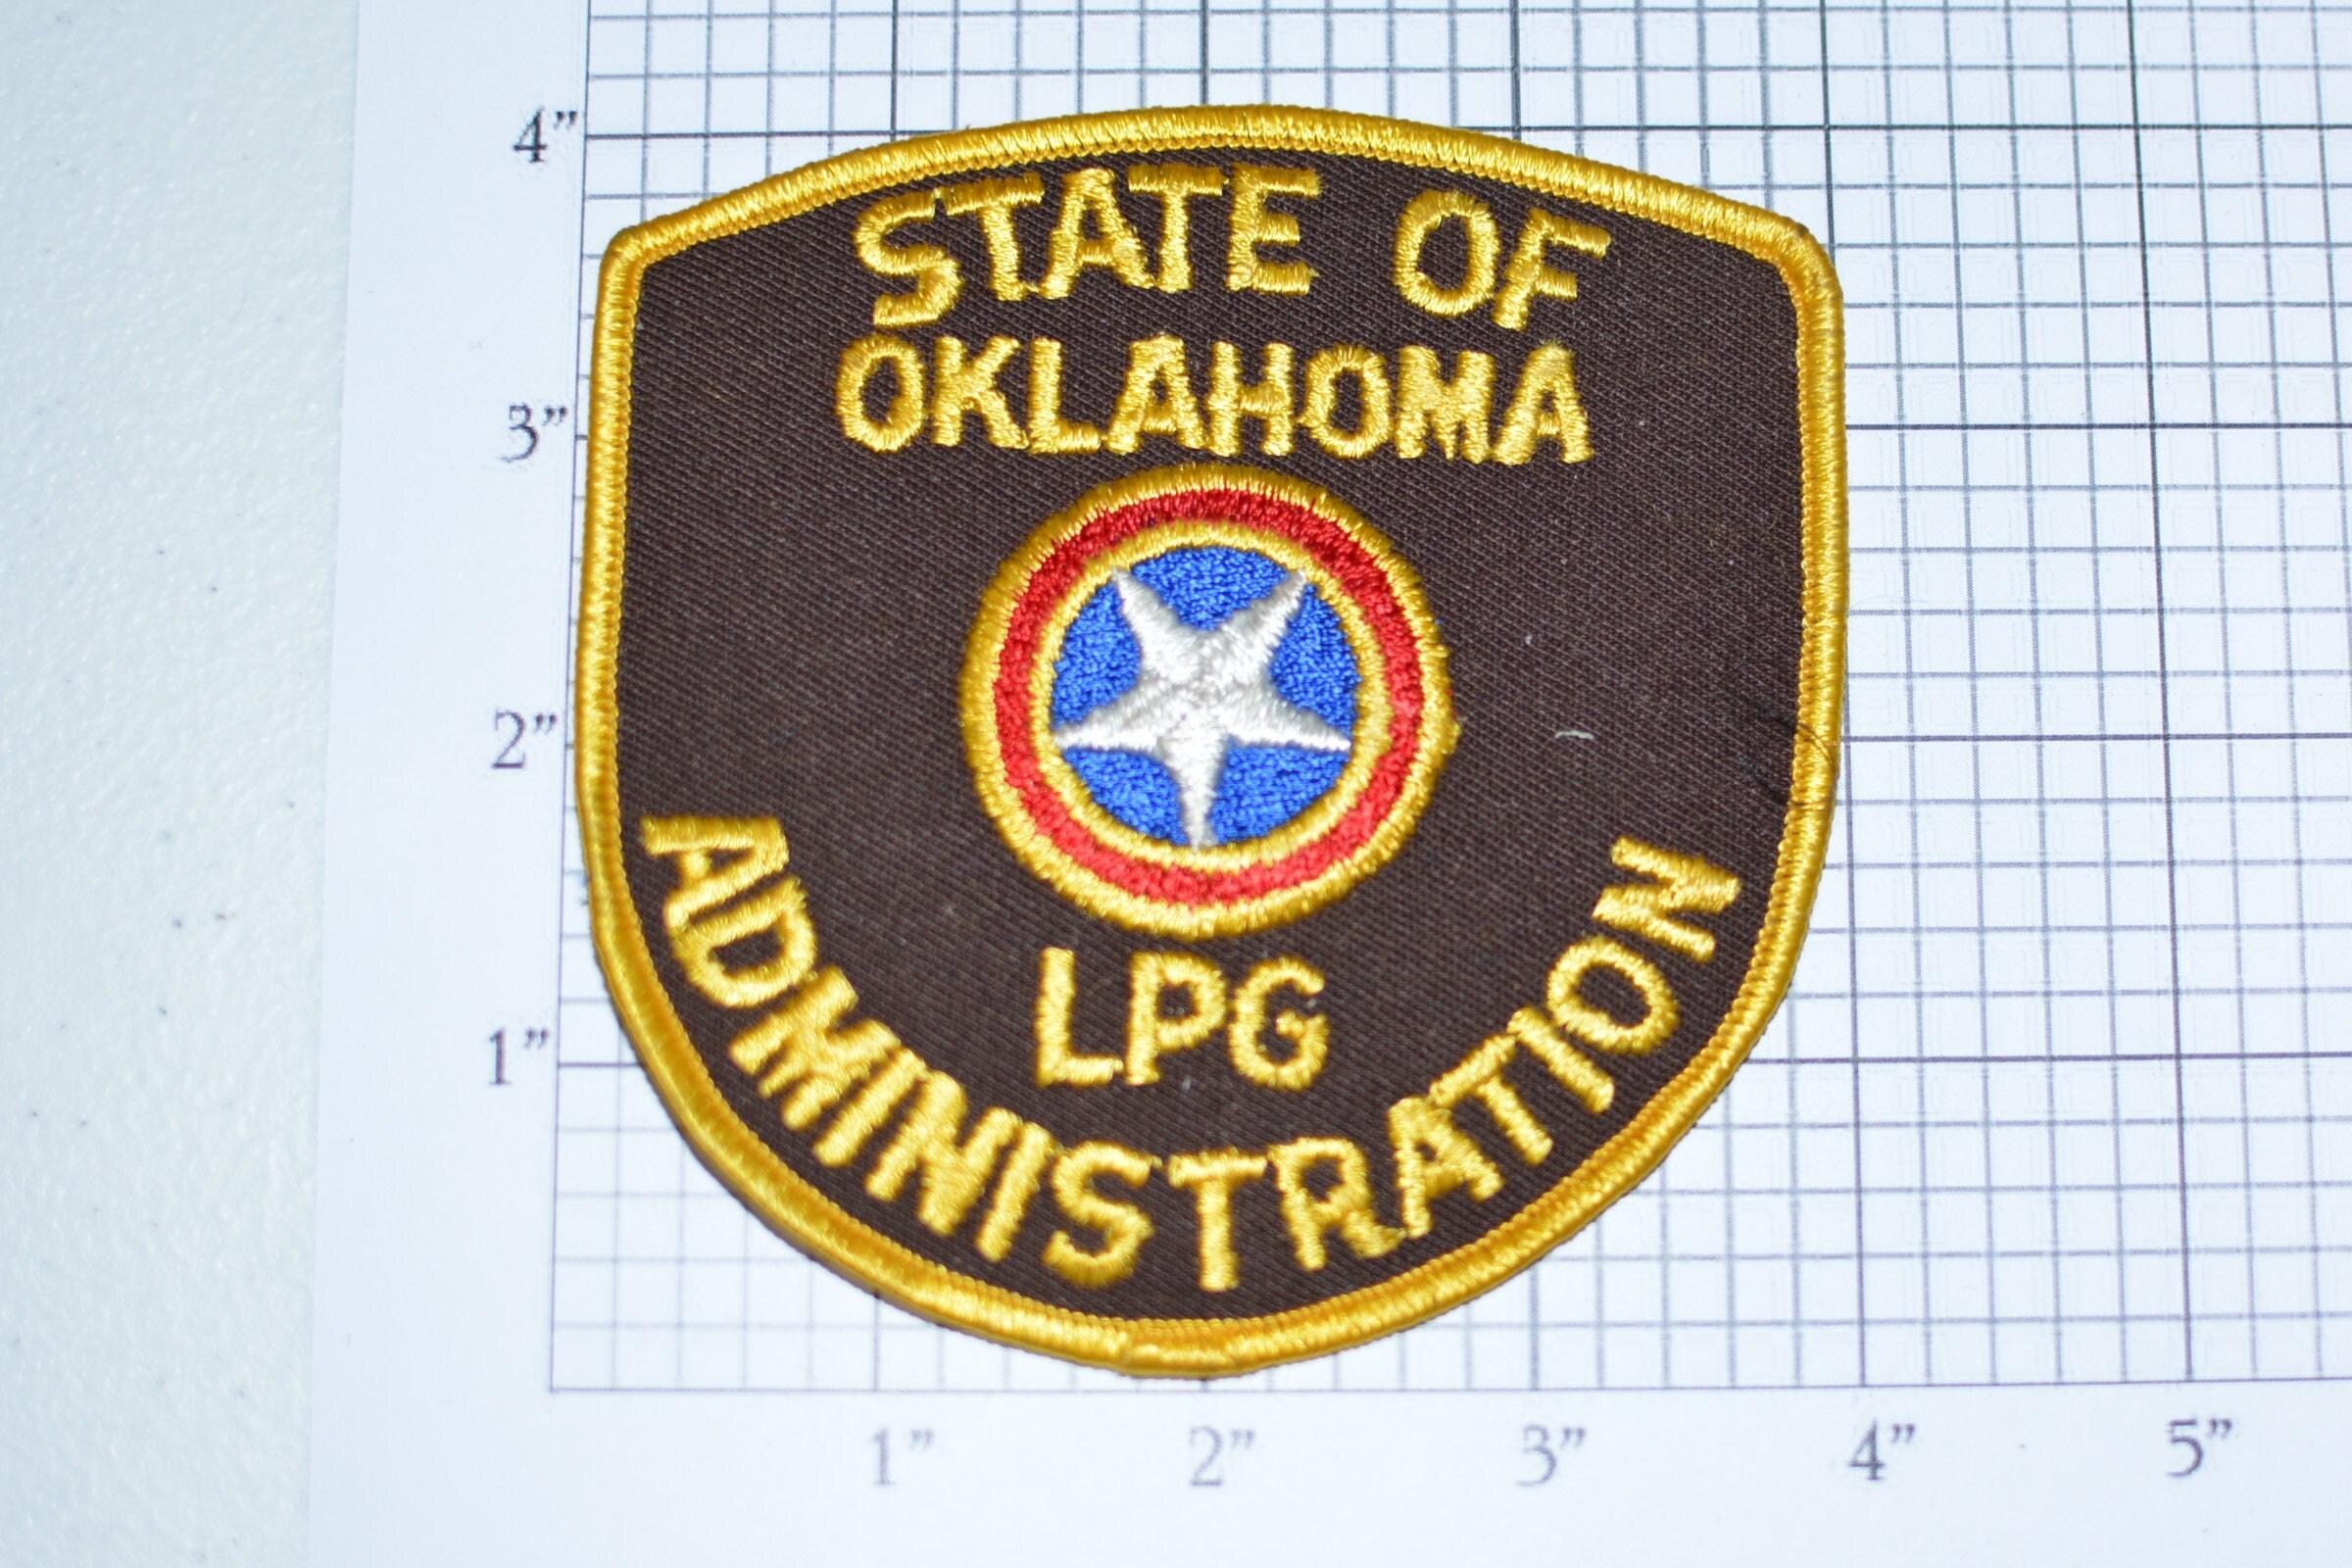 State of oklahoma lpg administration liquid propane gas